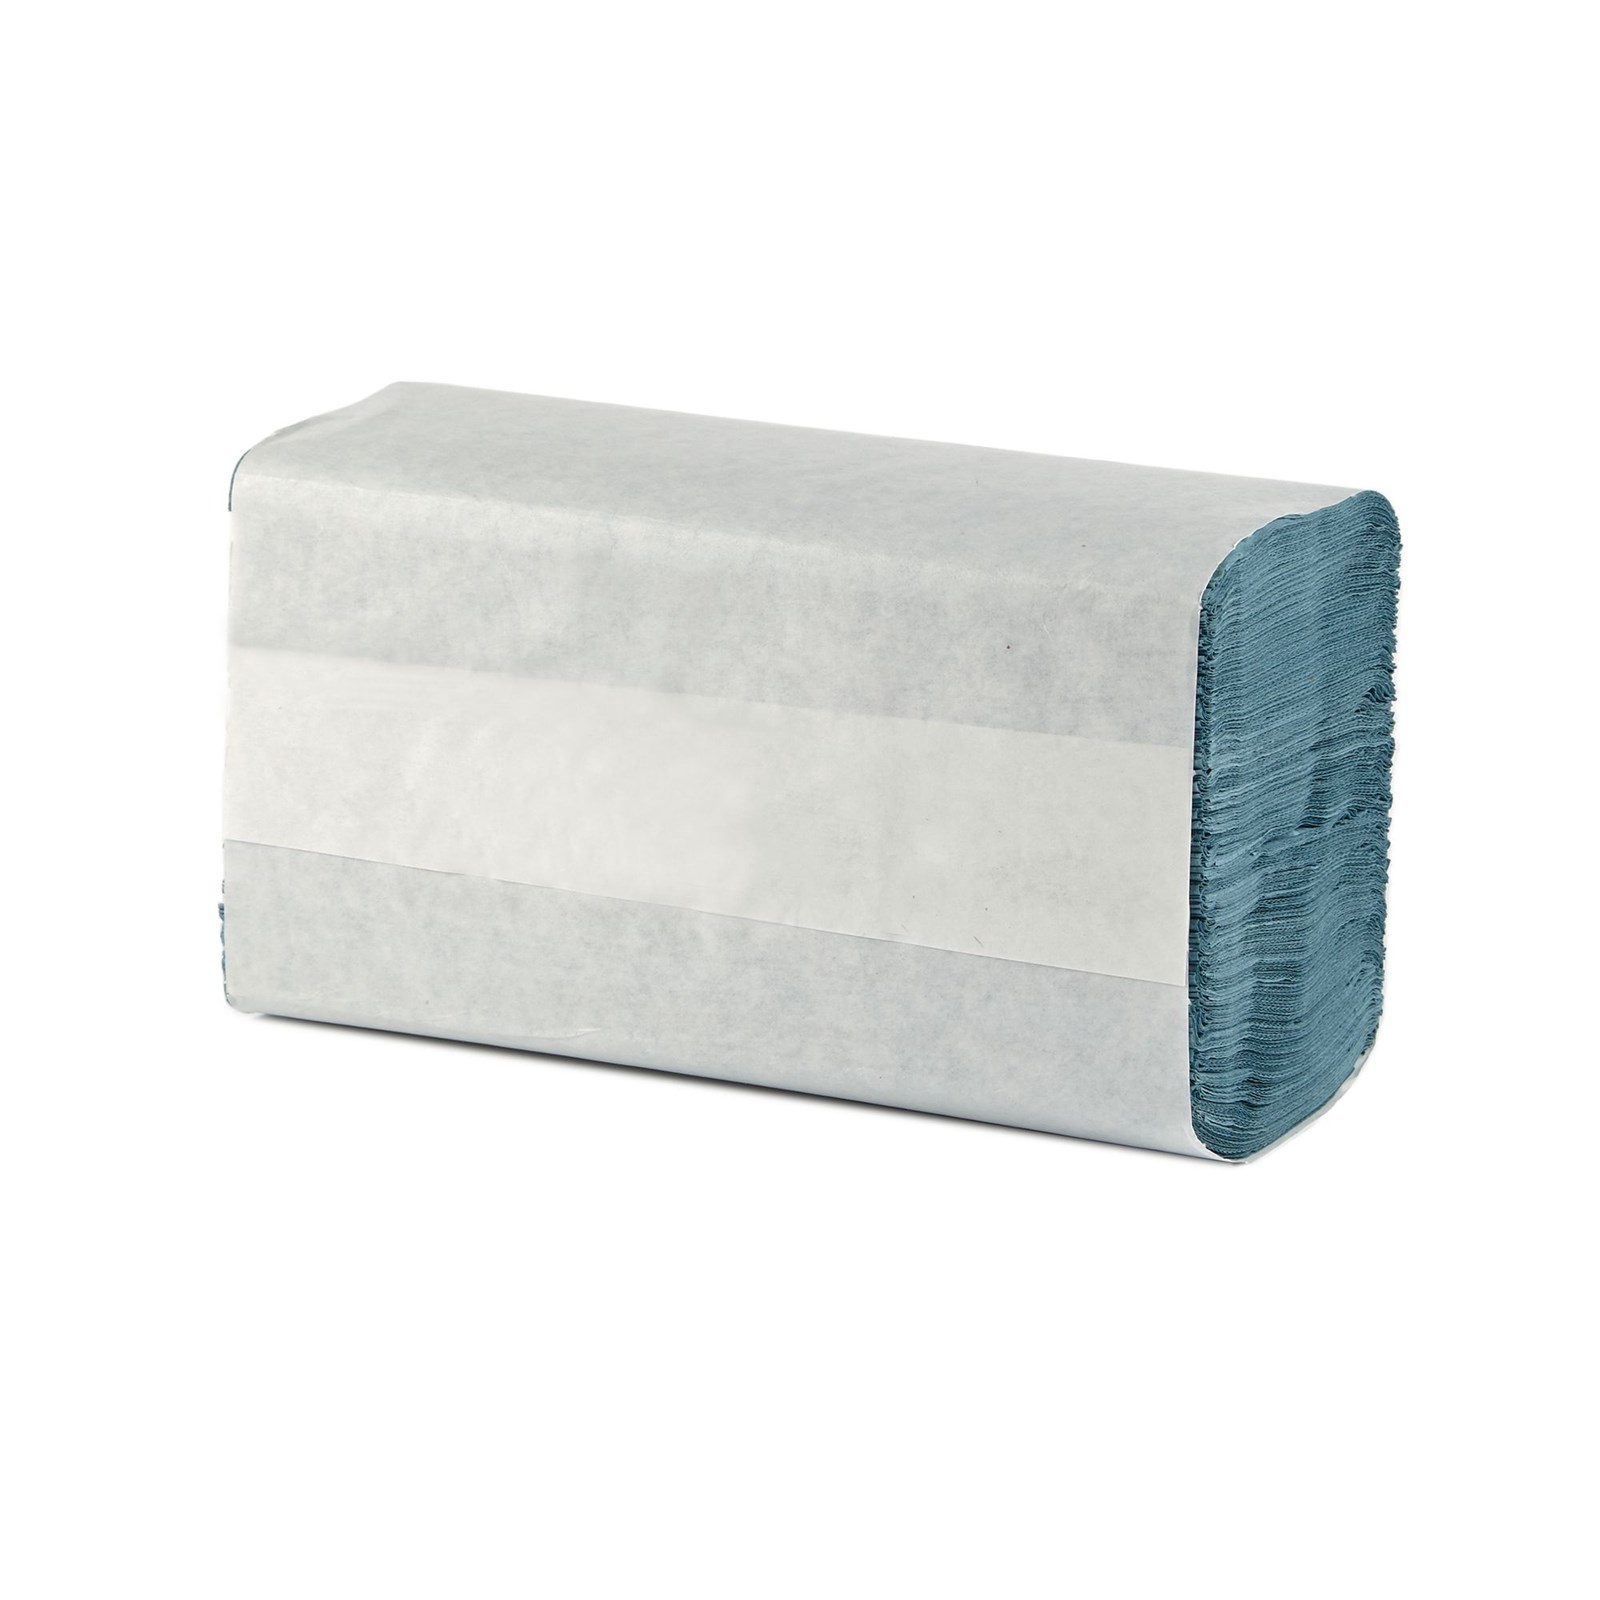 Classmates Z Fold Blue 1Ply Hand Towels